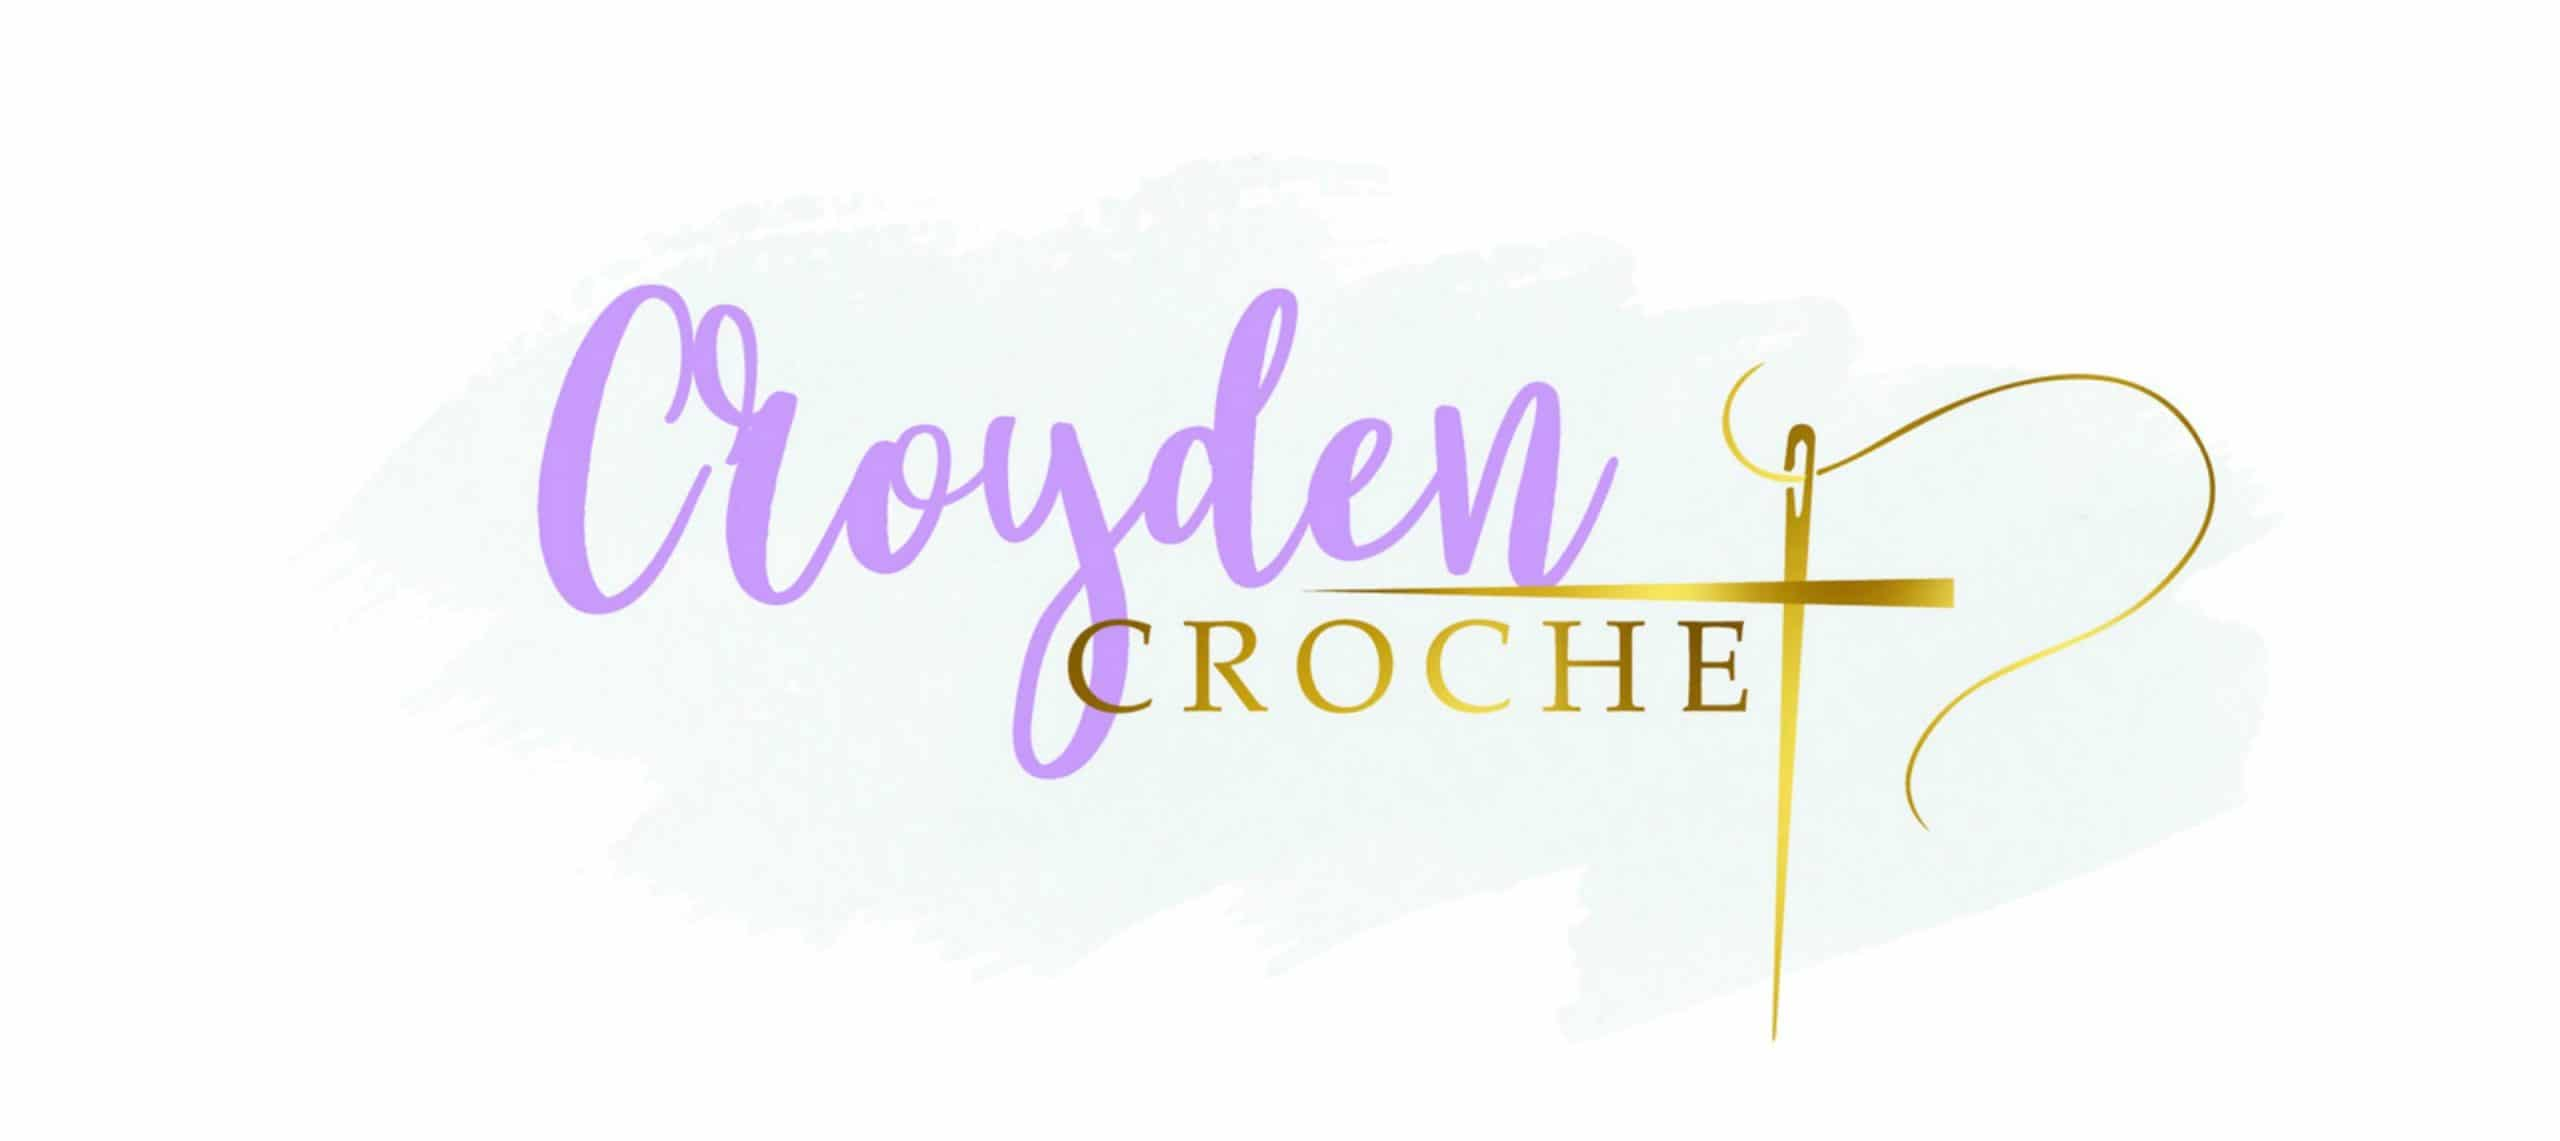 Croyden Crochet